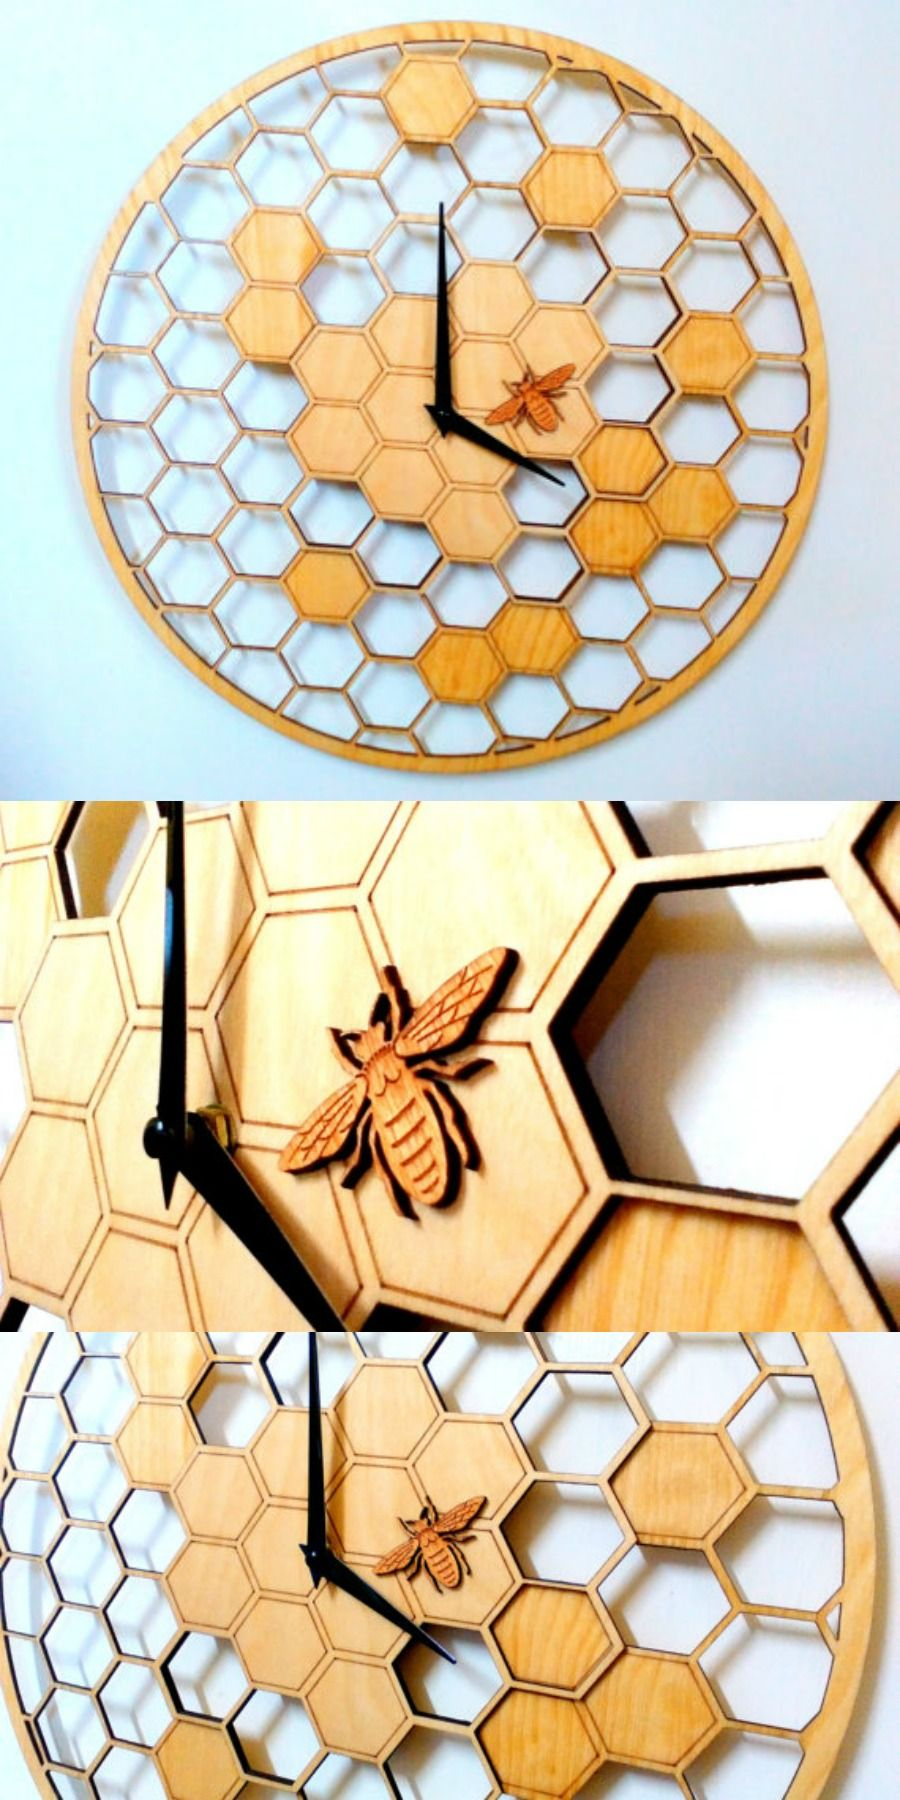 Bee honeycomb wooden wall clock, wall art, #ad #Etsy #bee #bees ...